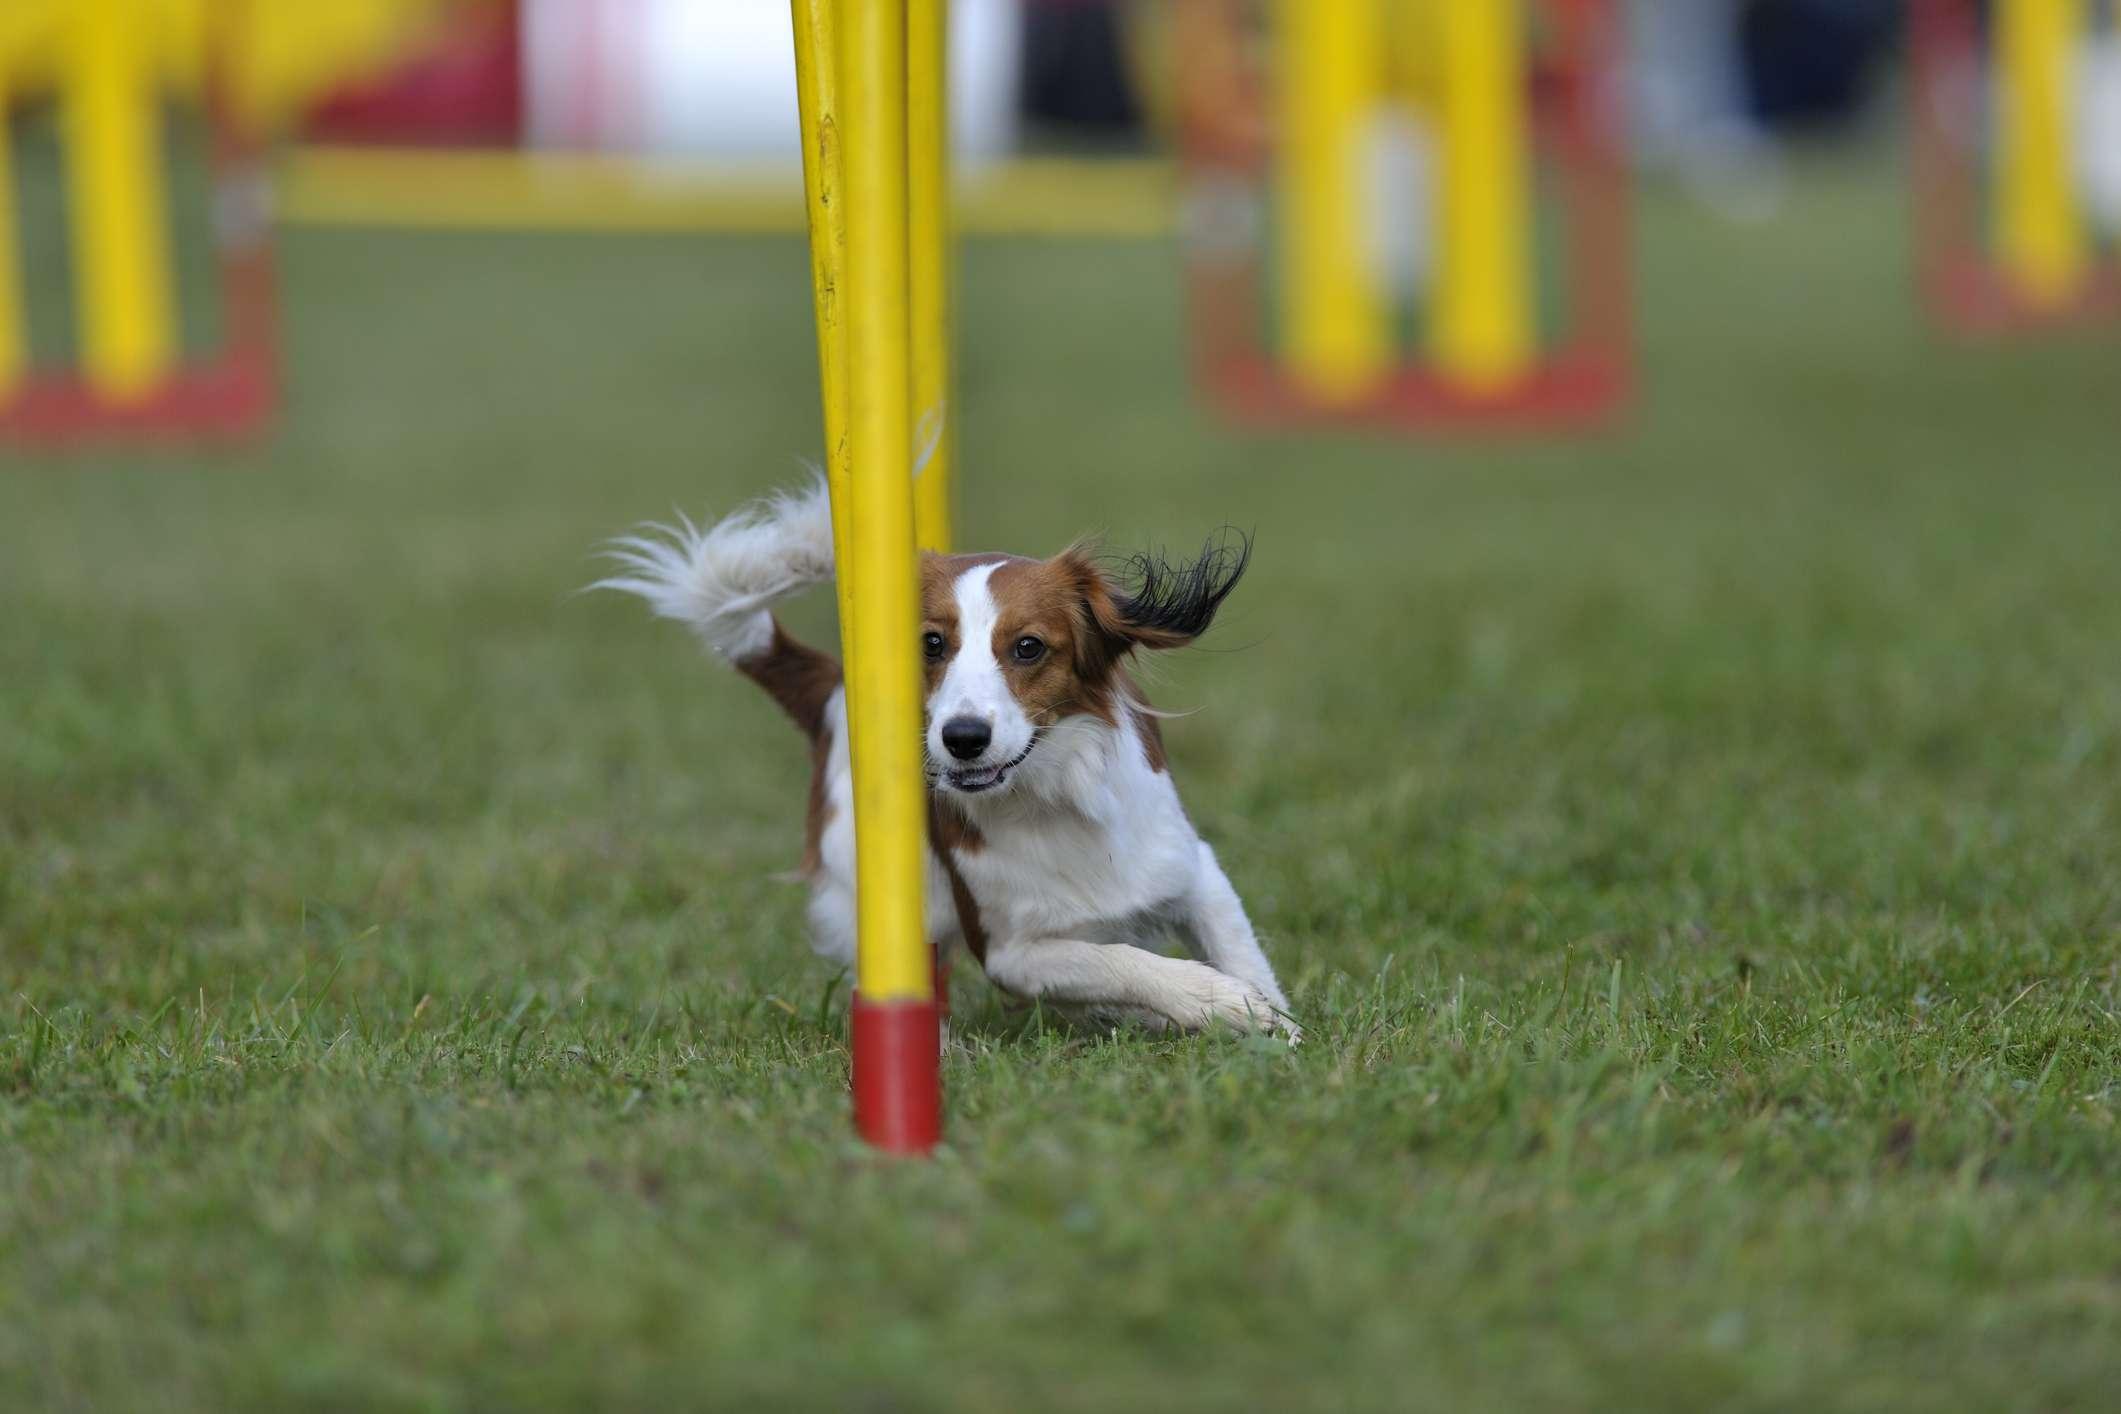 Kooiker in agility contest